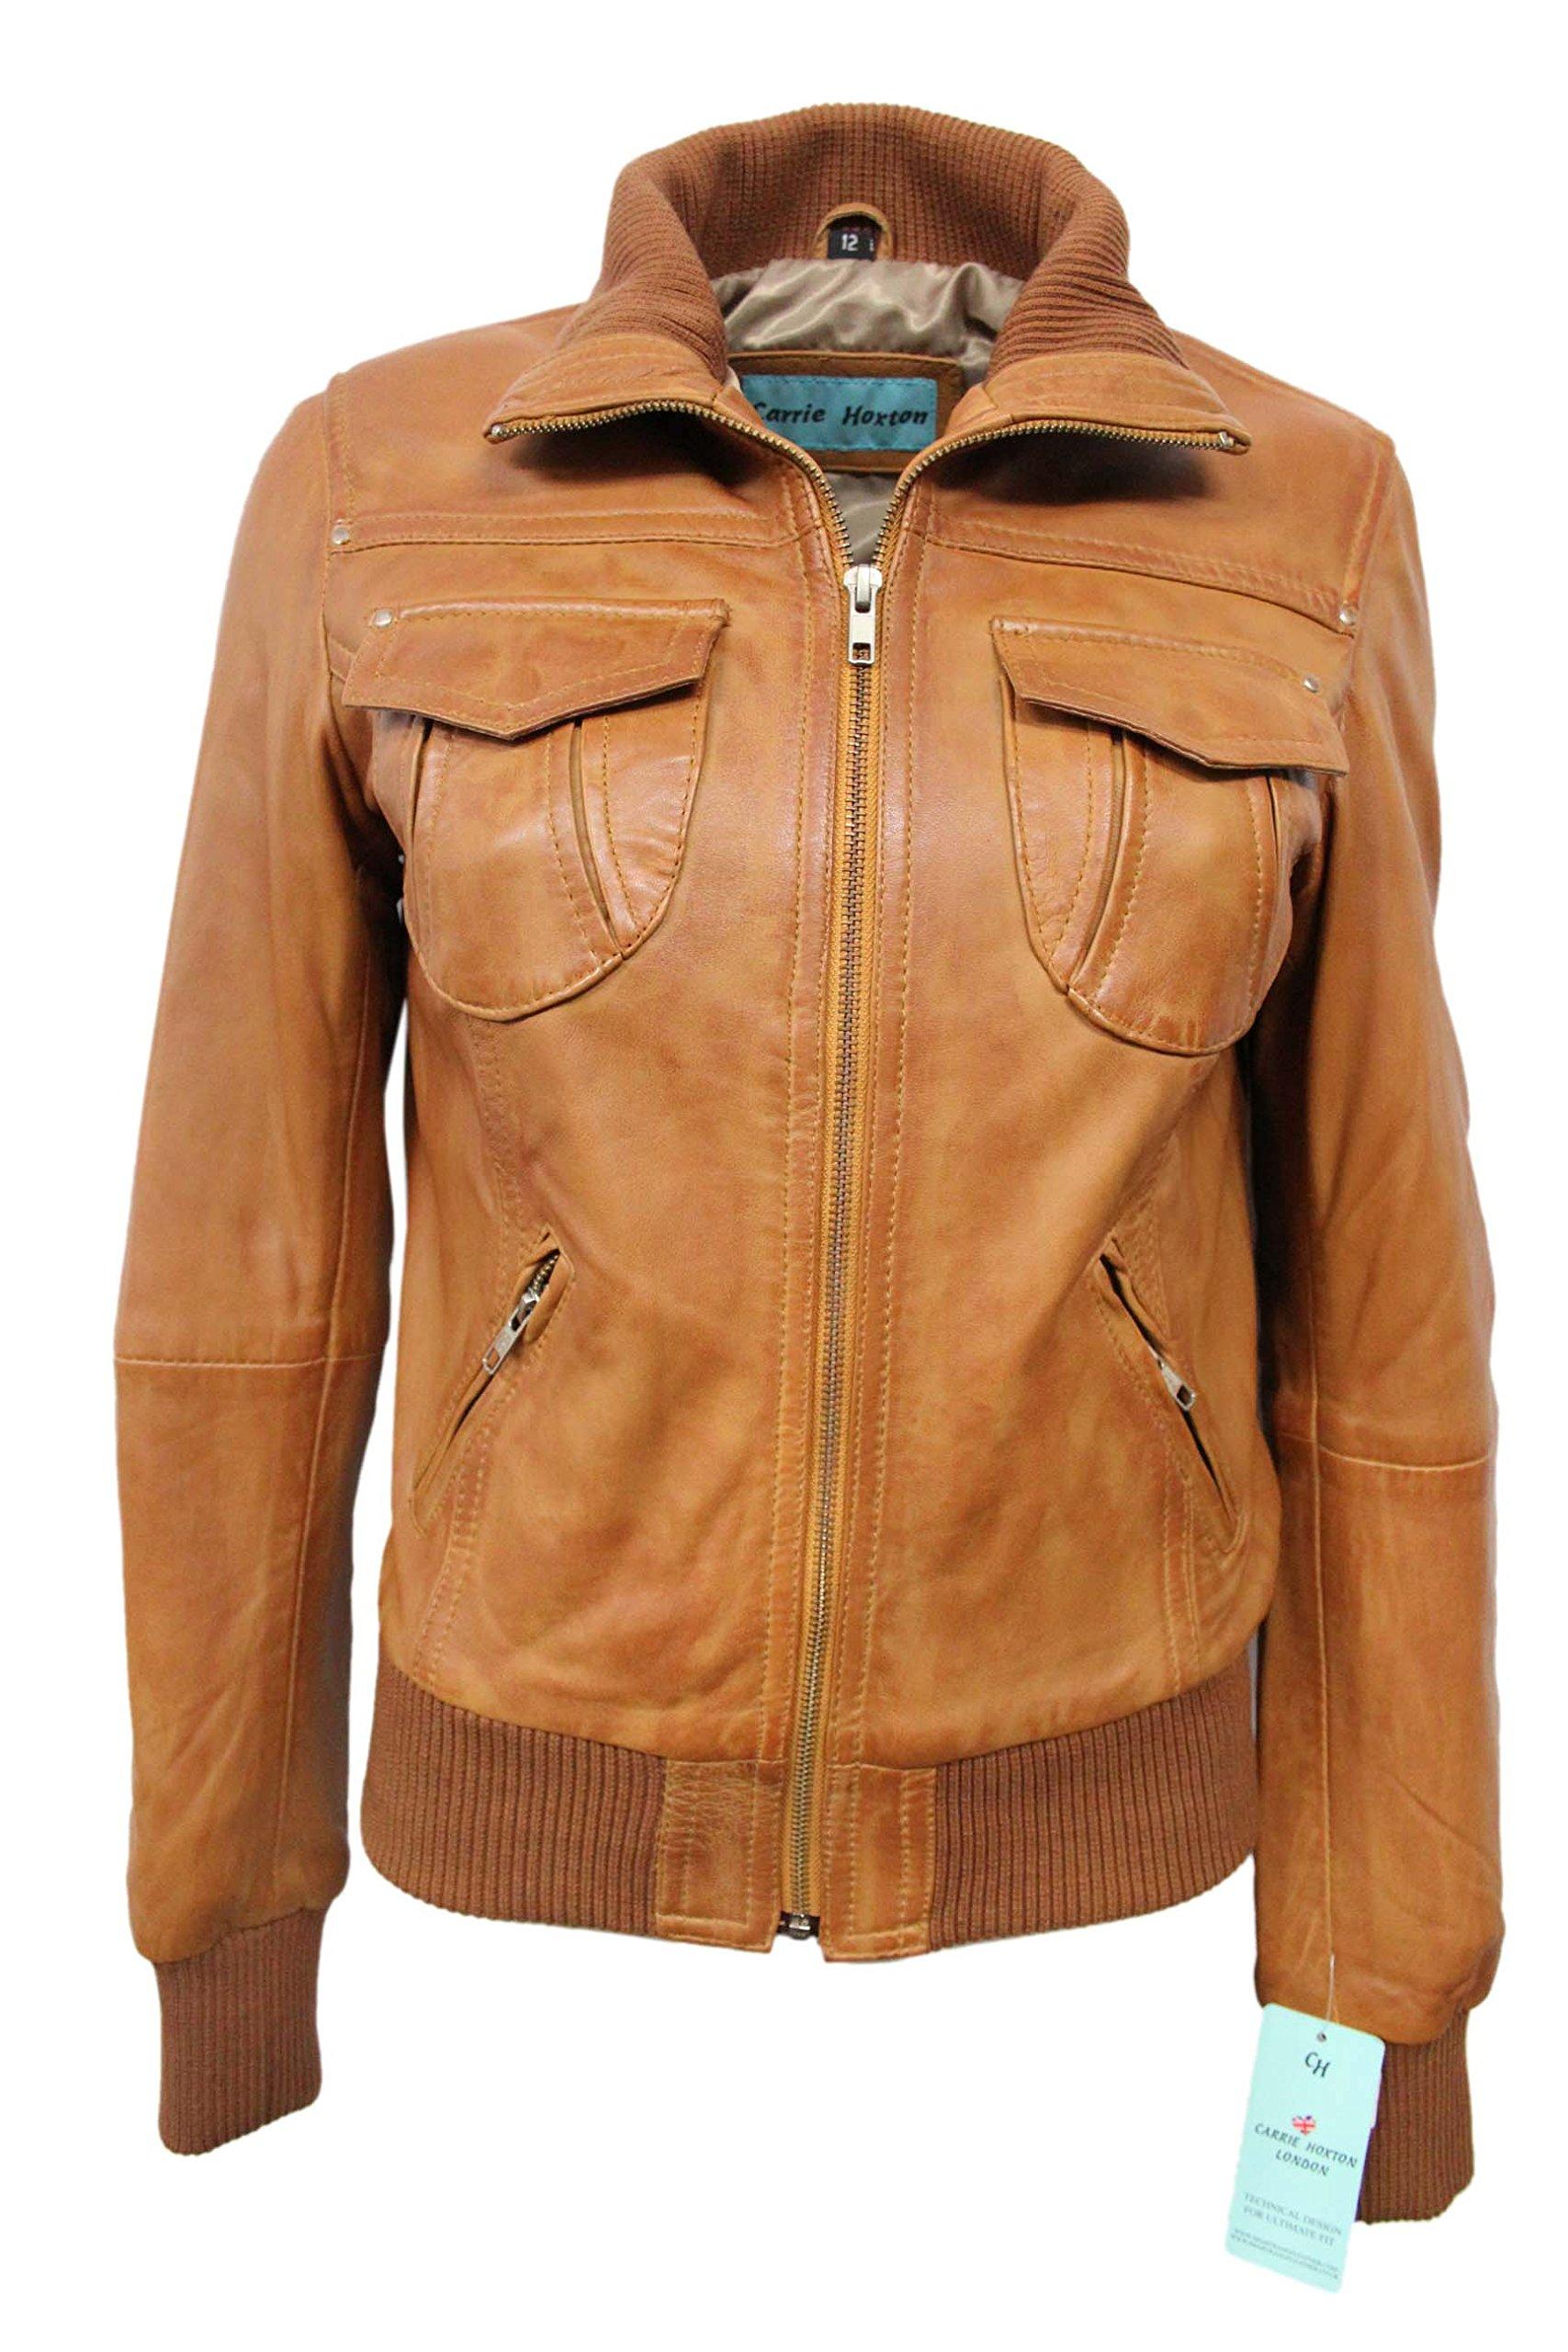 'Fusion' Ladies Tan Washed Short Bomber Biker Motorcycle Style Leather Jacket (UK 18/US 14, Tan) by Smart Range